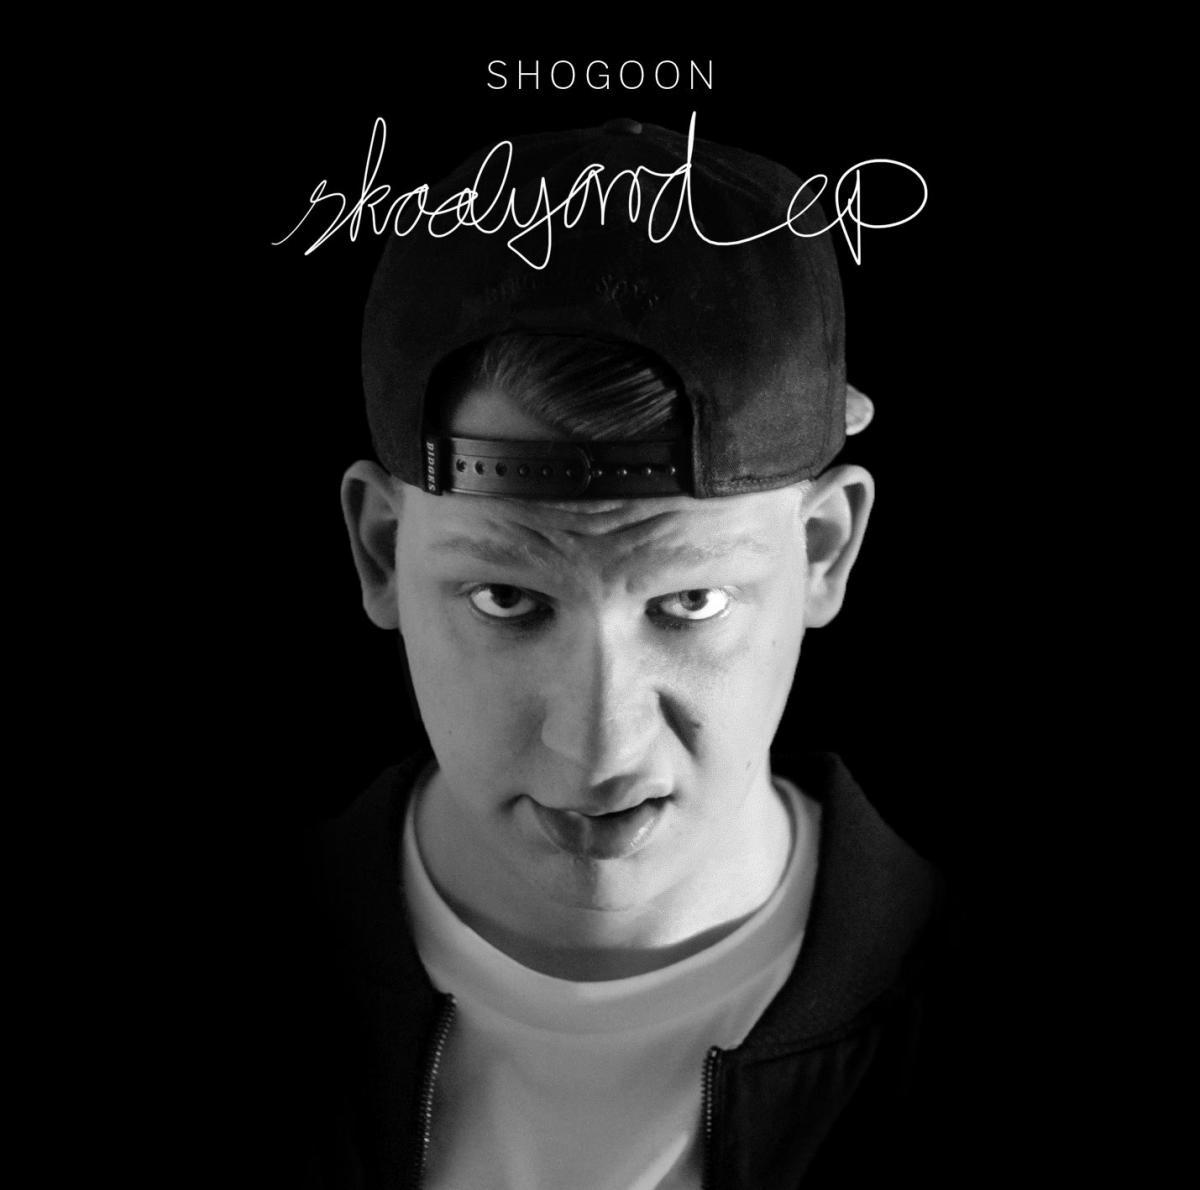 Upcoming: shogoon - Skoolyard (Official Video)